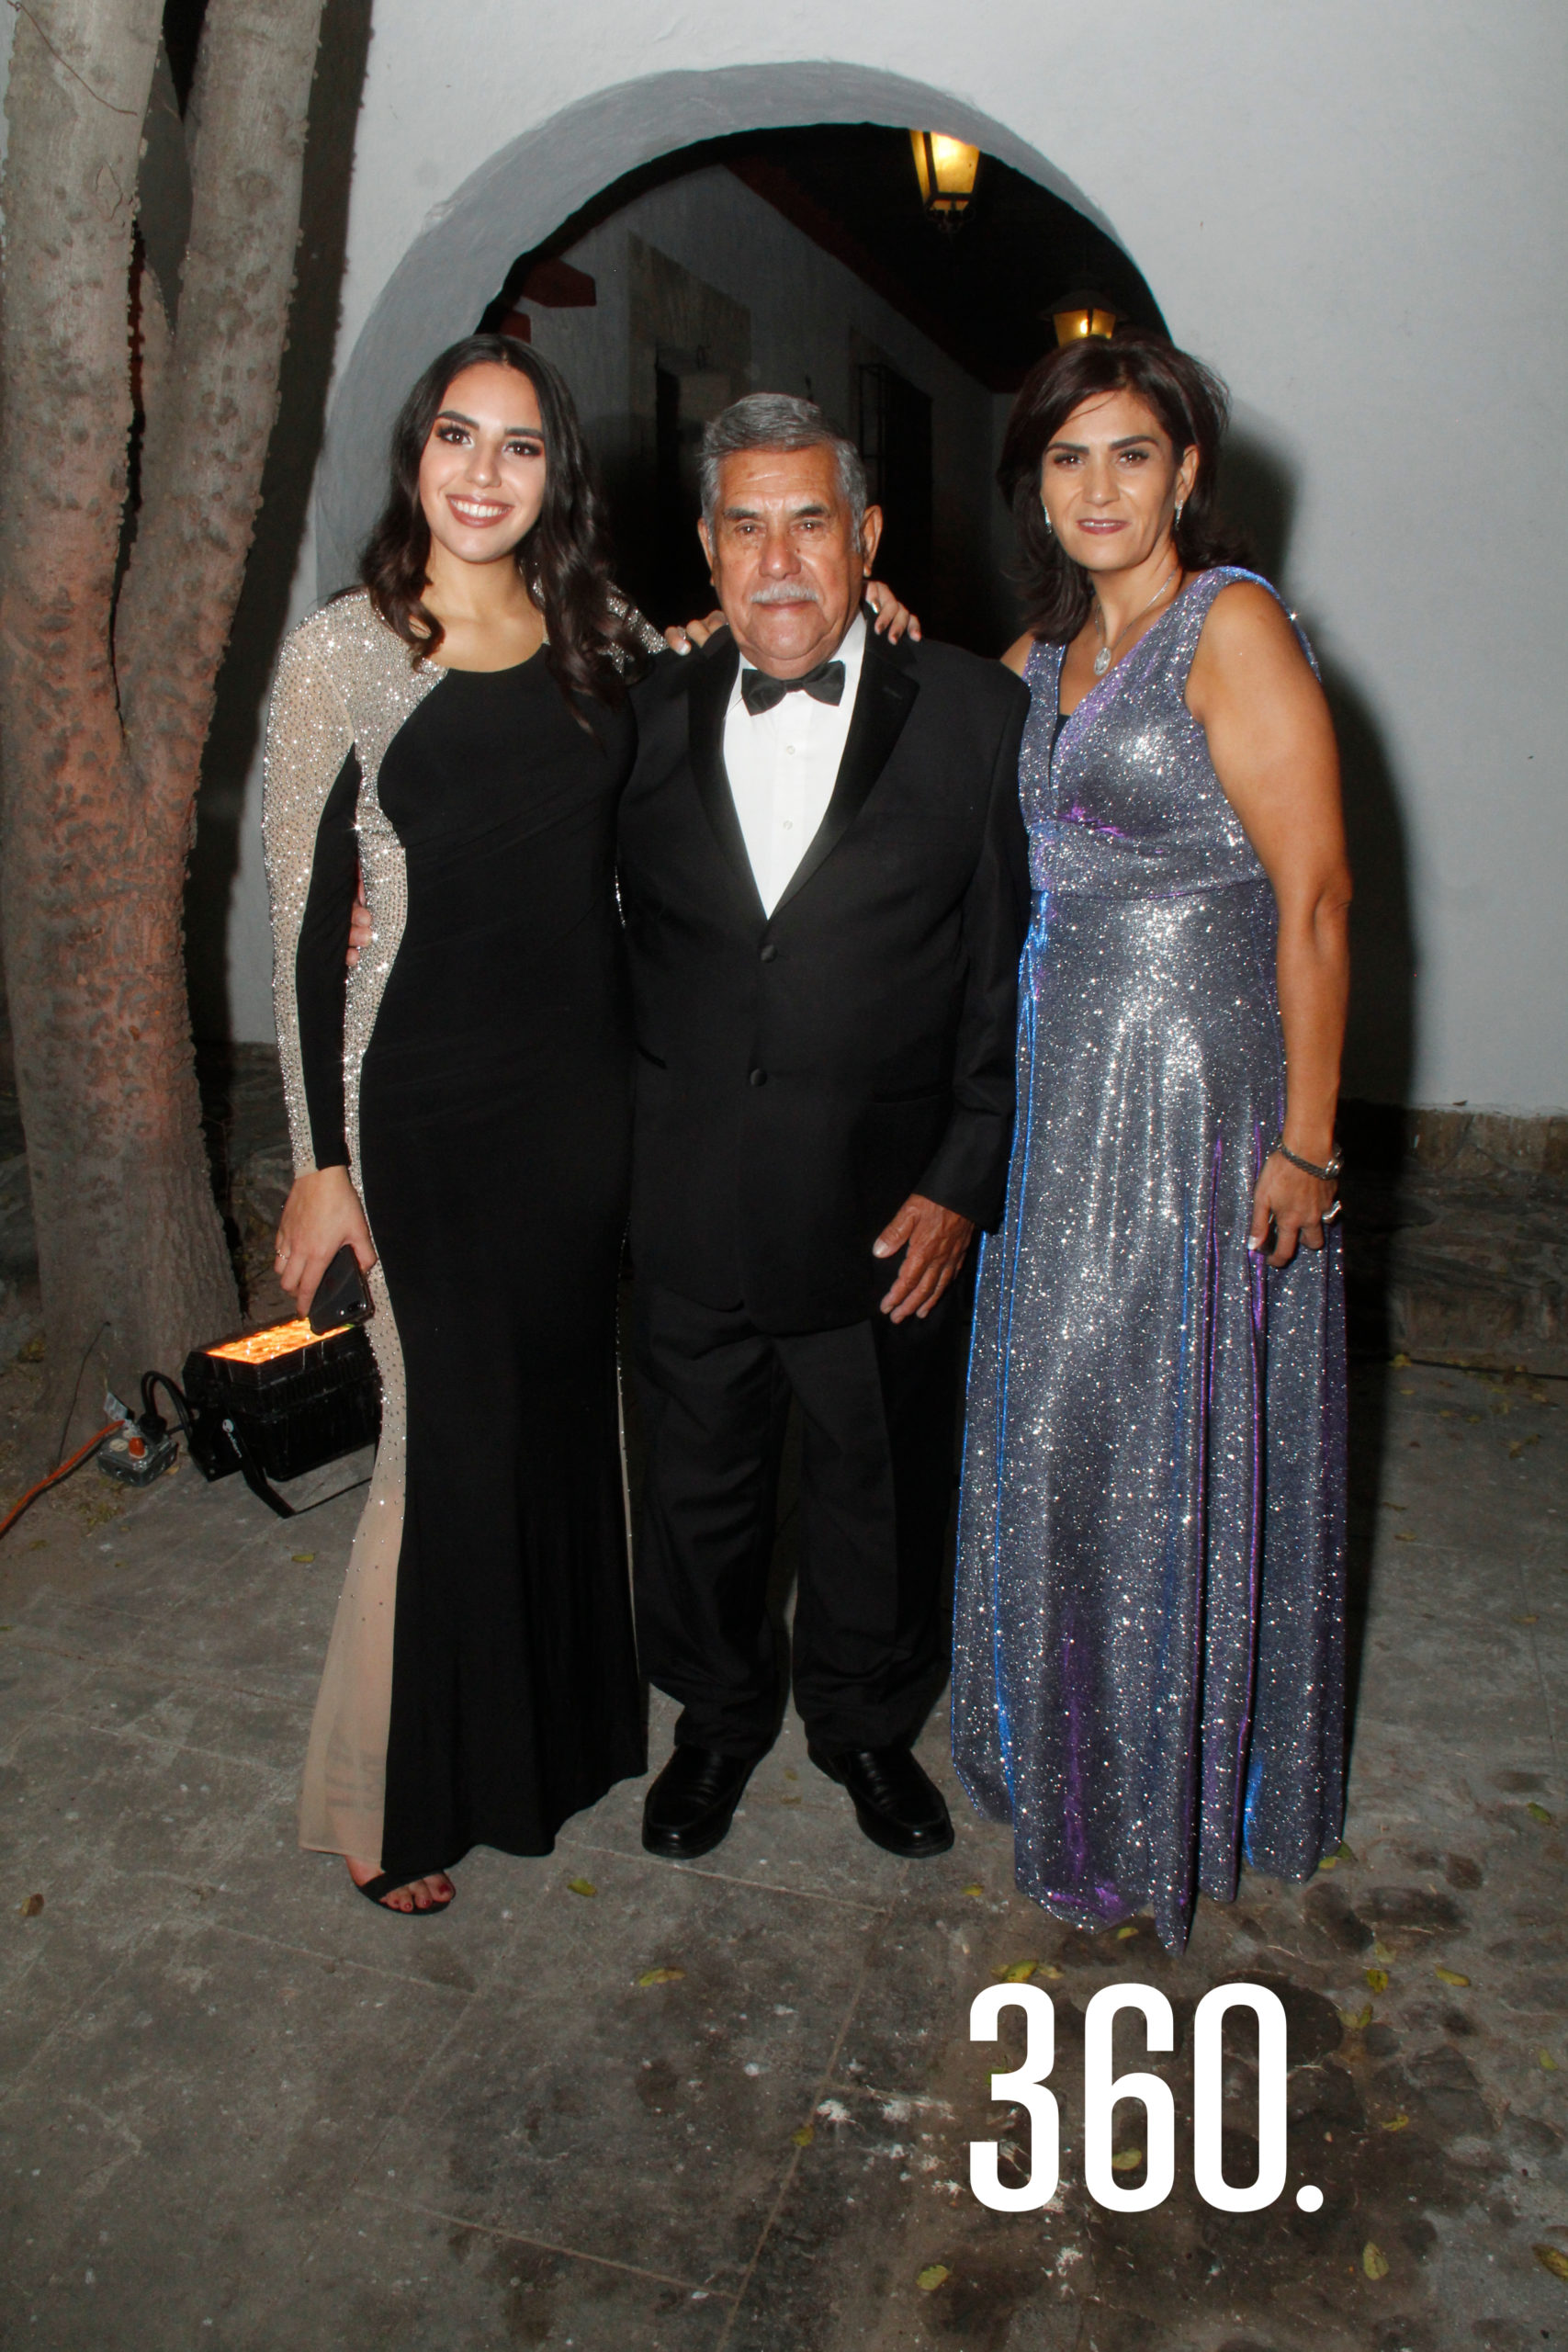 Don Antonio Zapata, abuelito del novio, acompañado por Melissa Pepi y Martha Zapata.